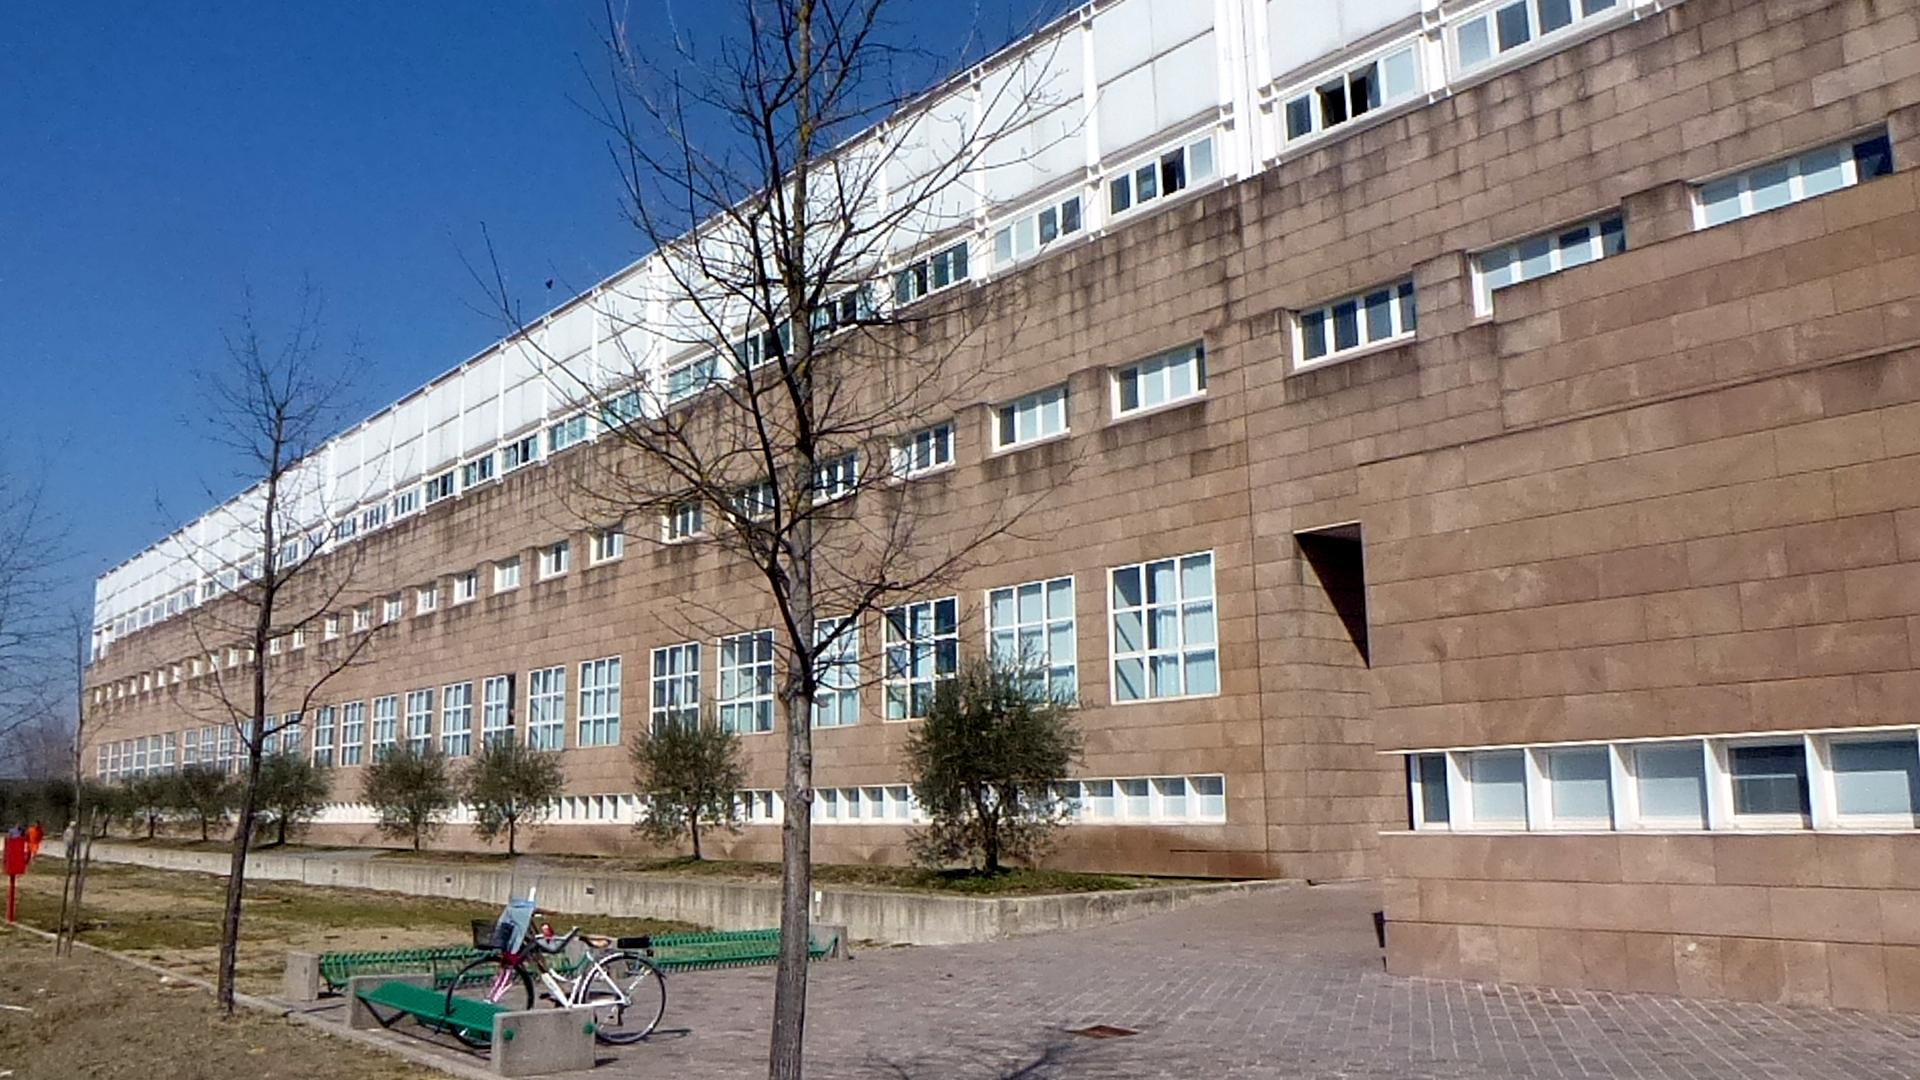 Ospedale_del_Valdarno